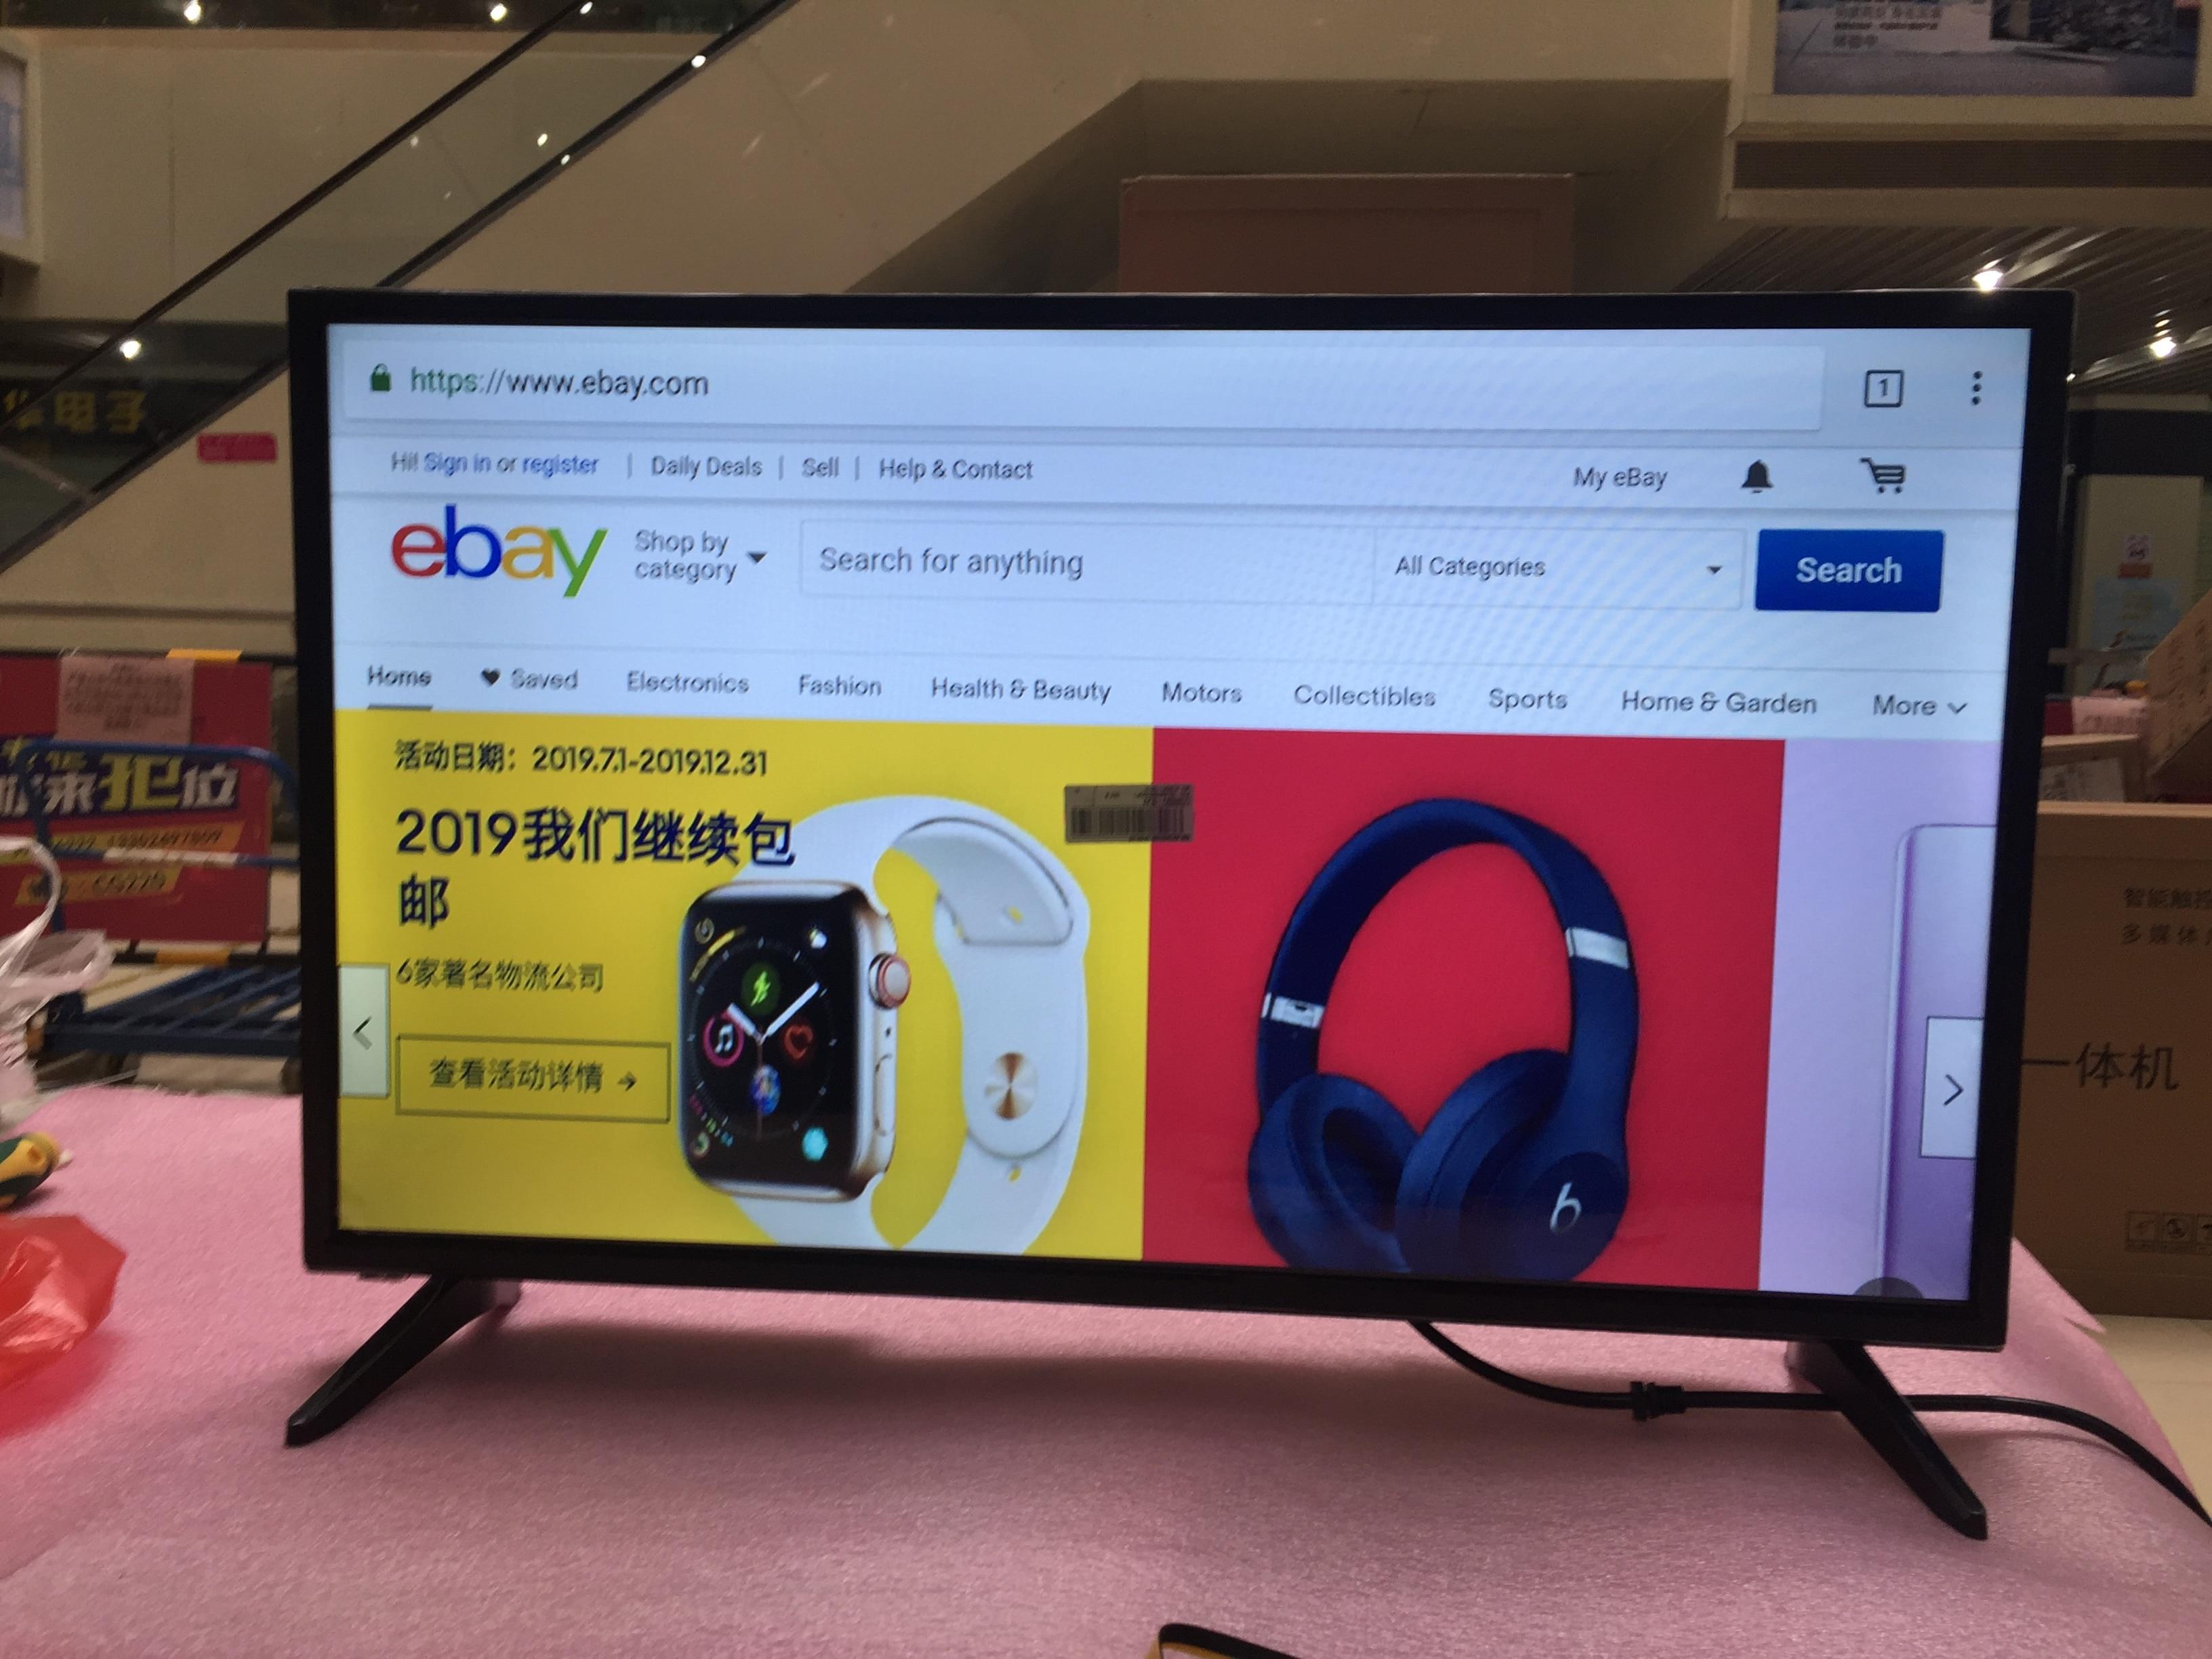 32 pulgadas monitor HD Wifi TV Smart Android 7.1.1 Ram 1GB ROM 4GB internet televisión led tv